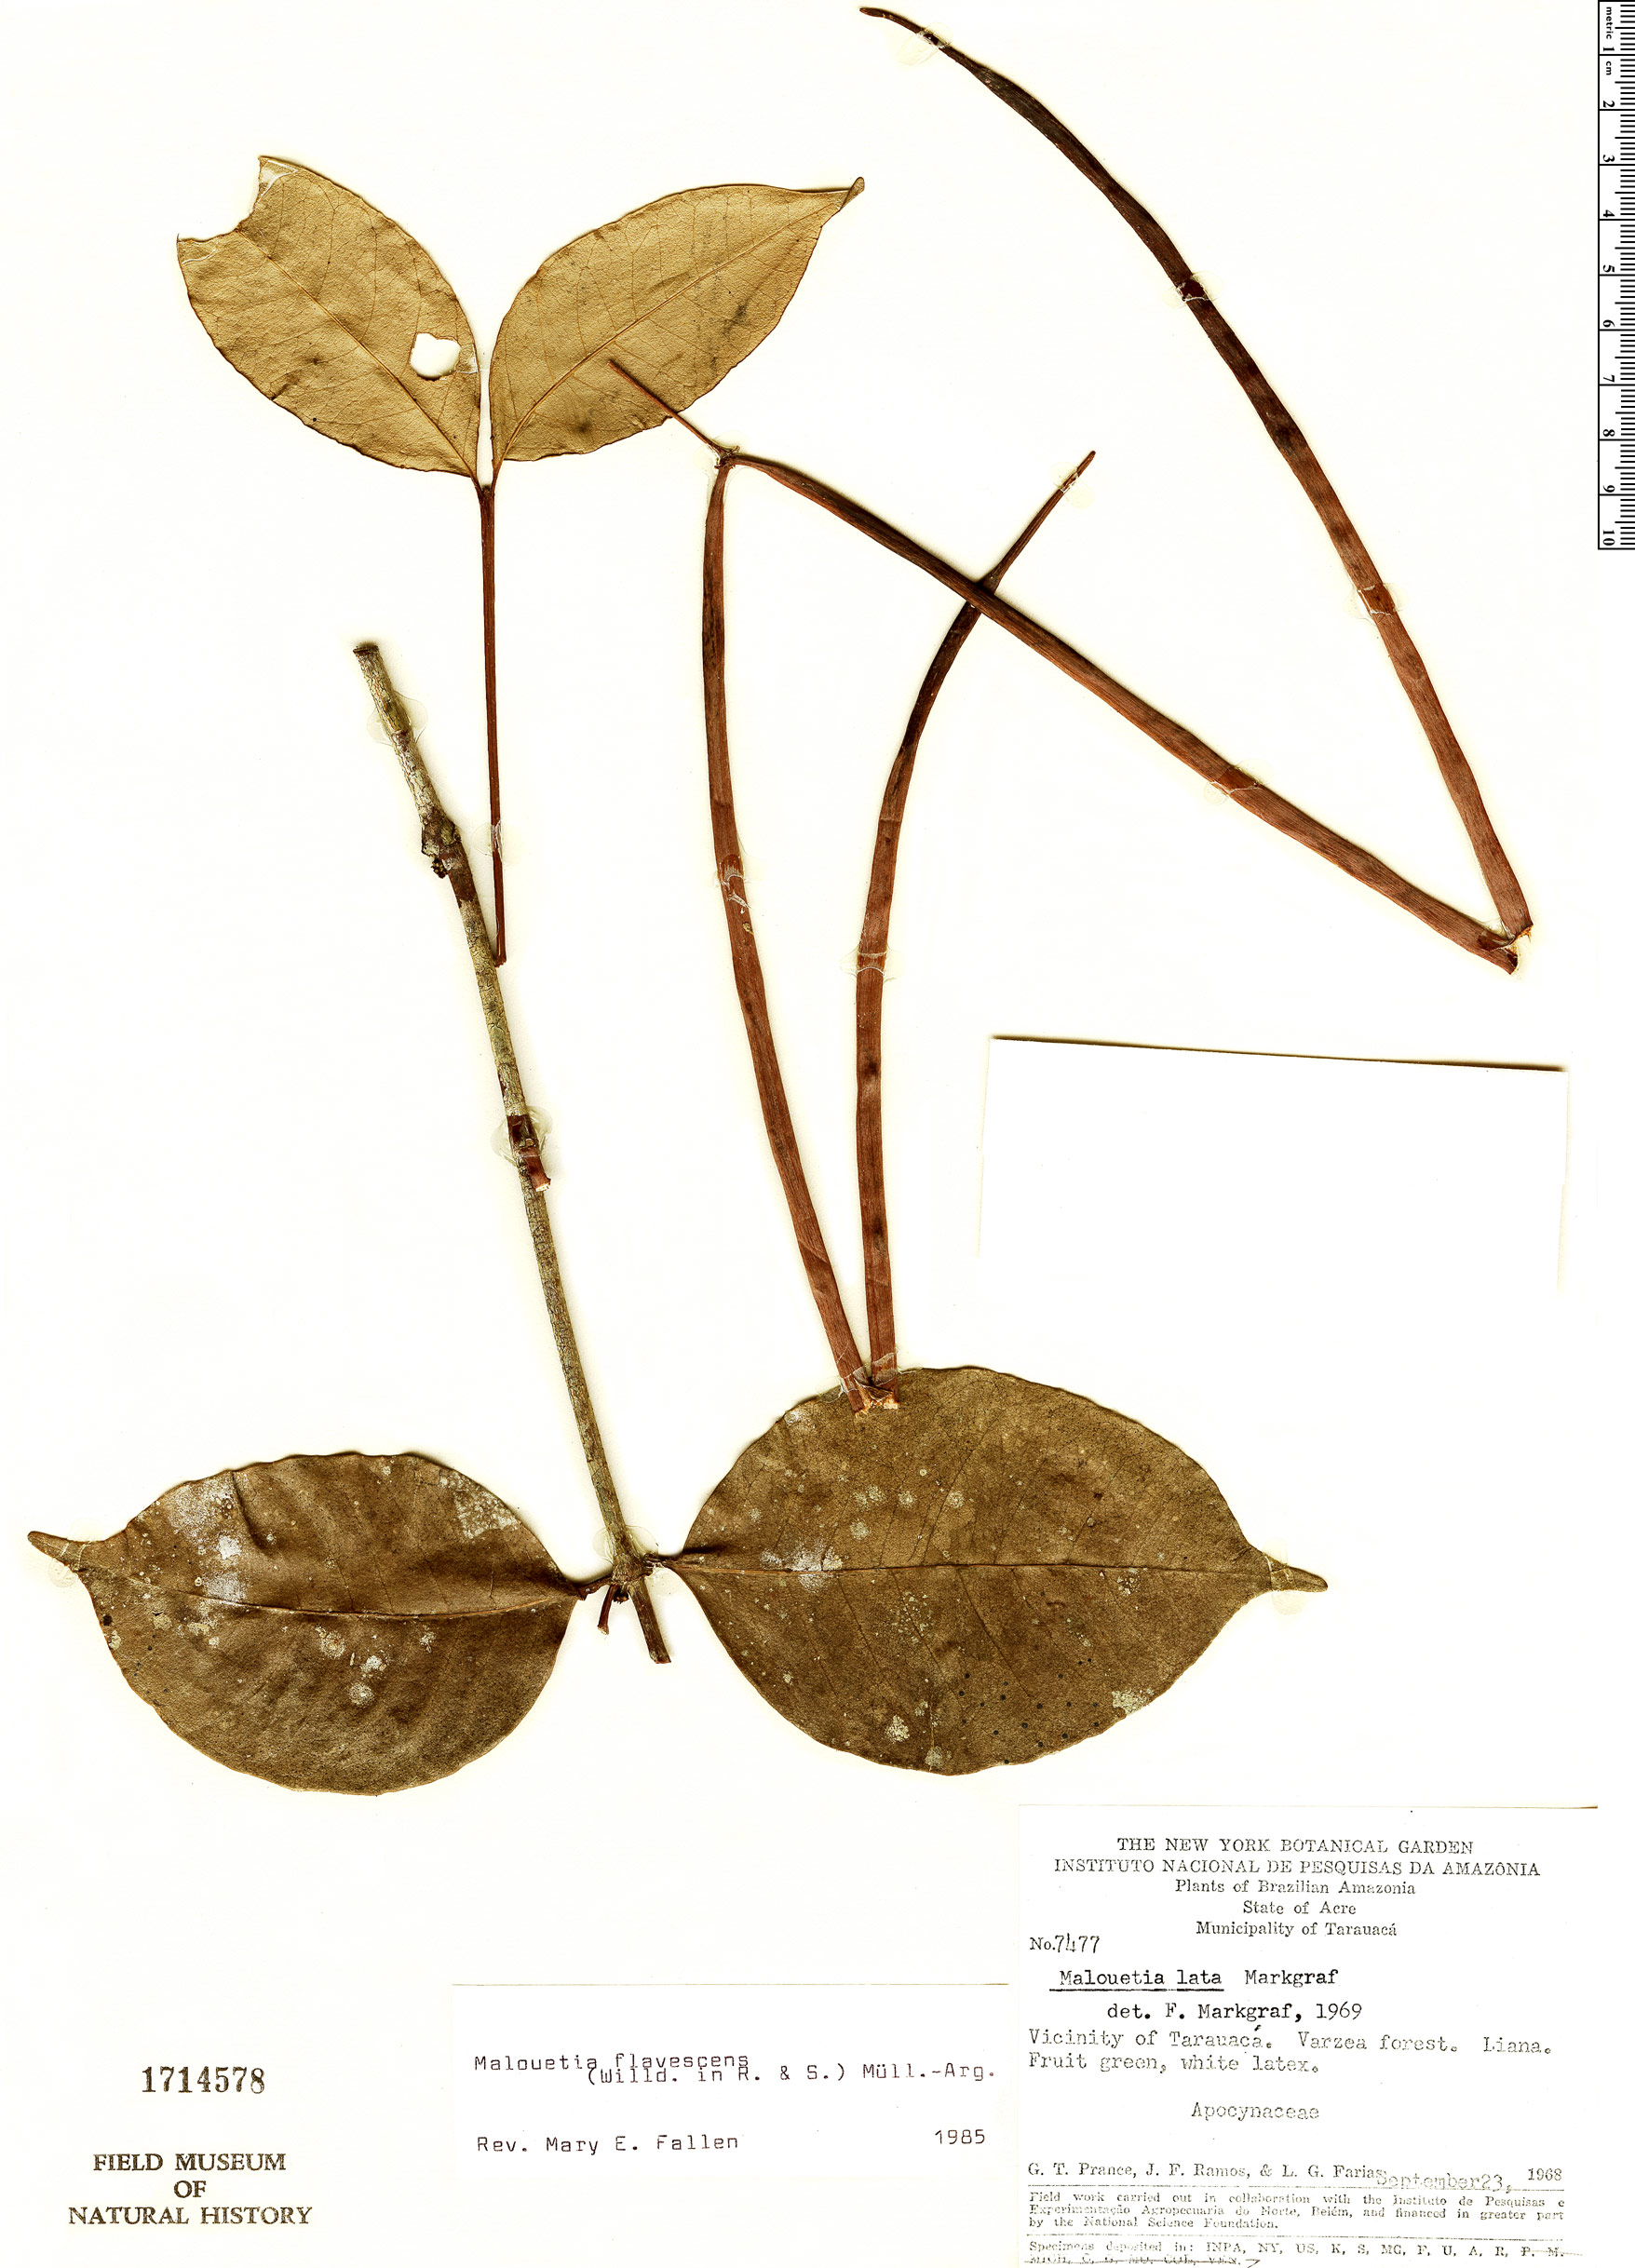 Espécimen: Malouetia flavescens